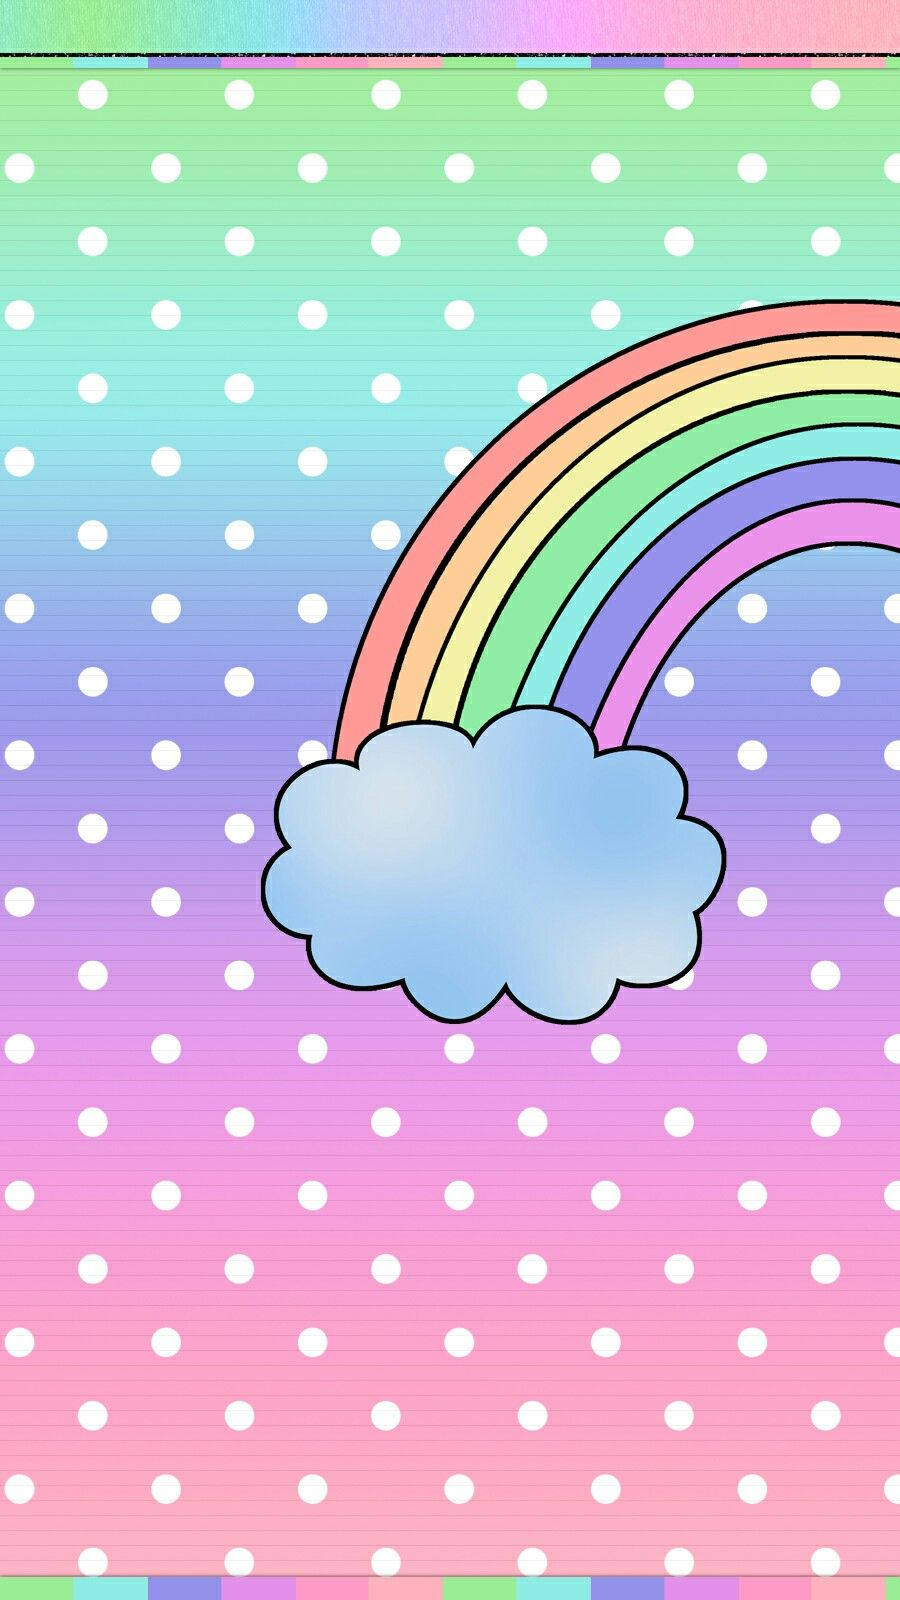 32 Best Free Cute Rainbow iPhone Wallpapers - WallpaperAccess Cute Rainbow Wallpapers